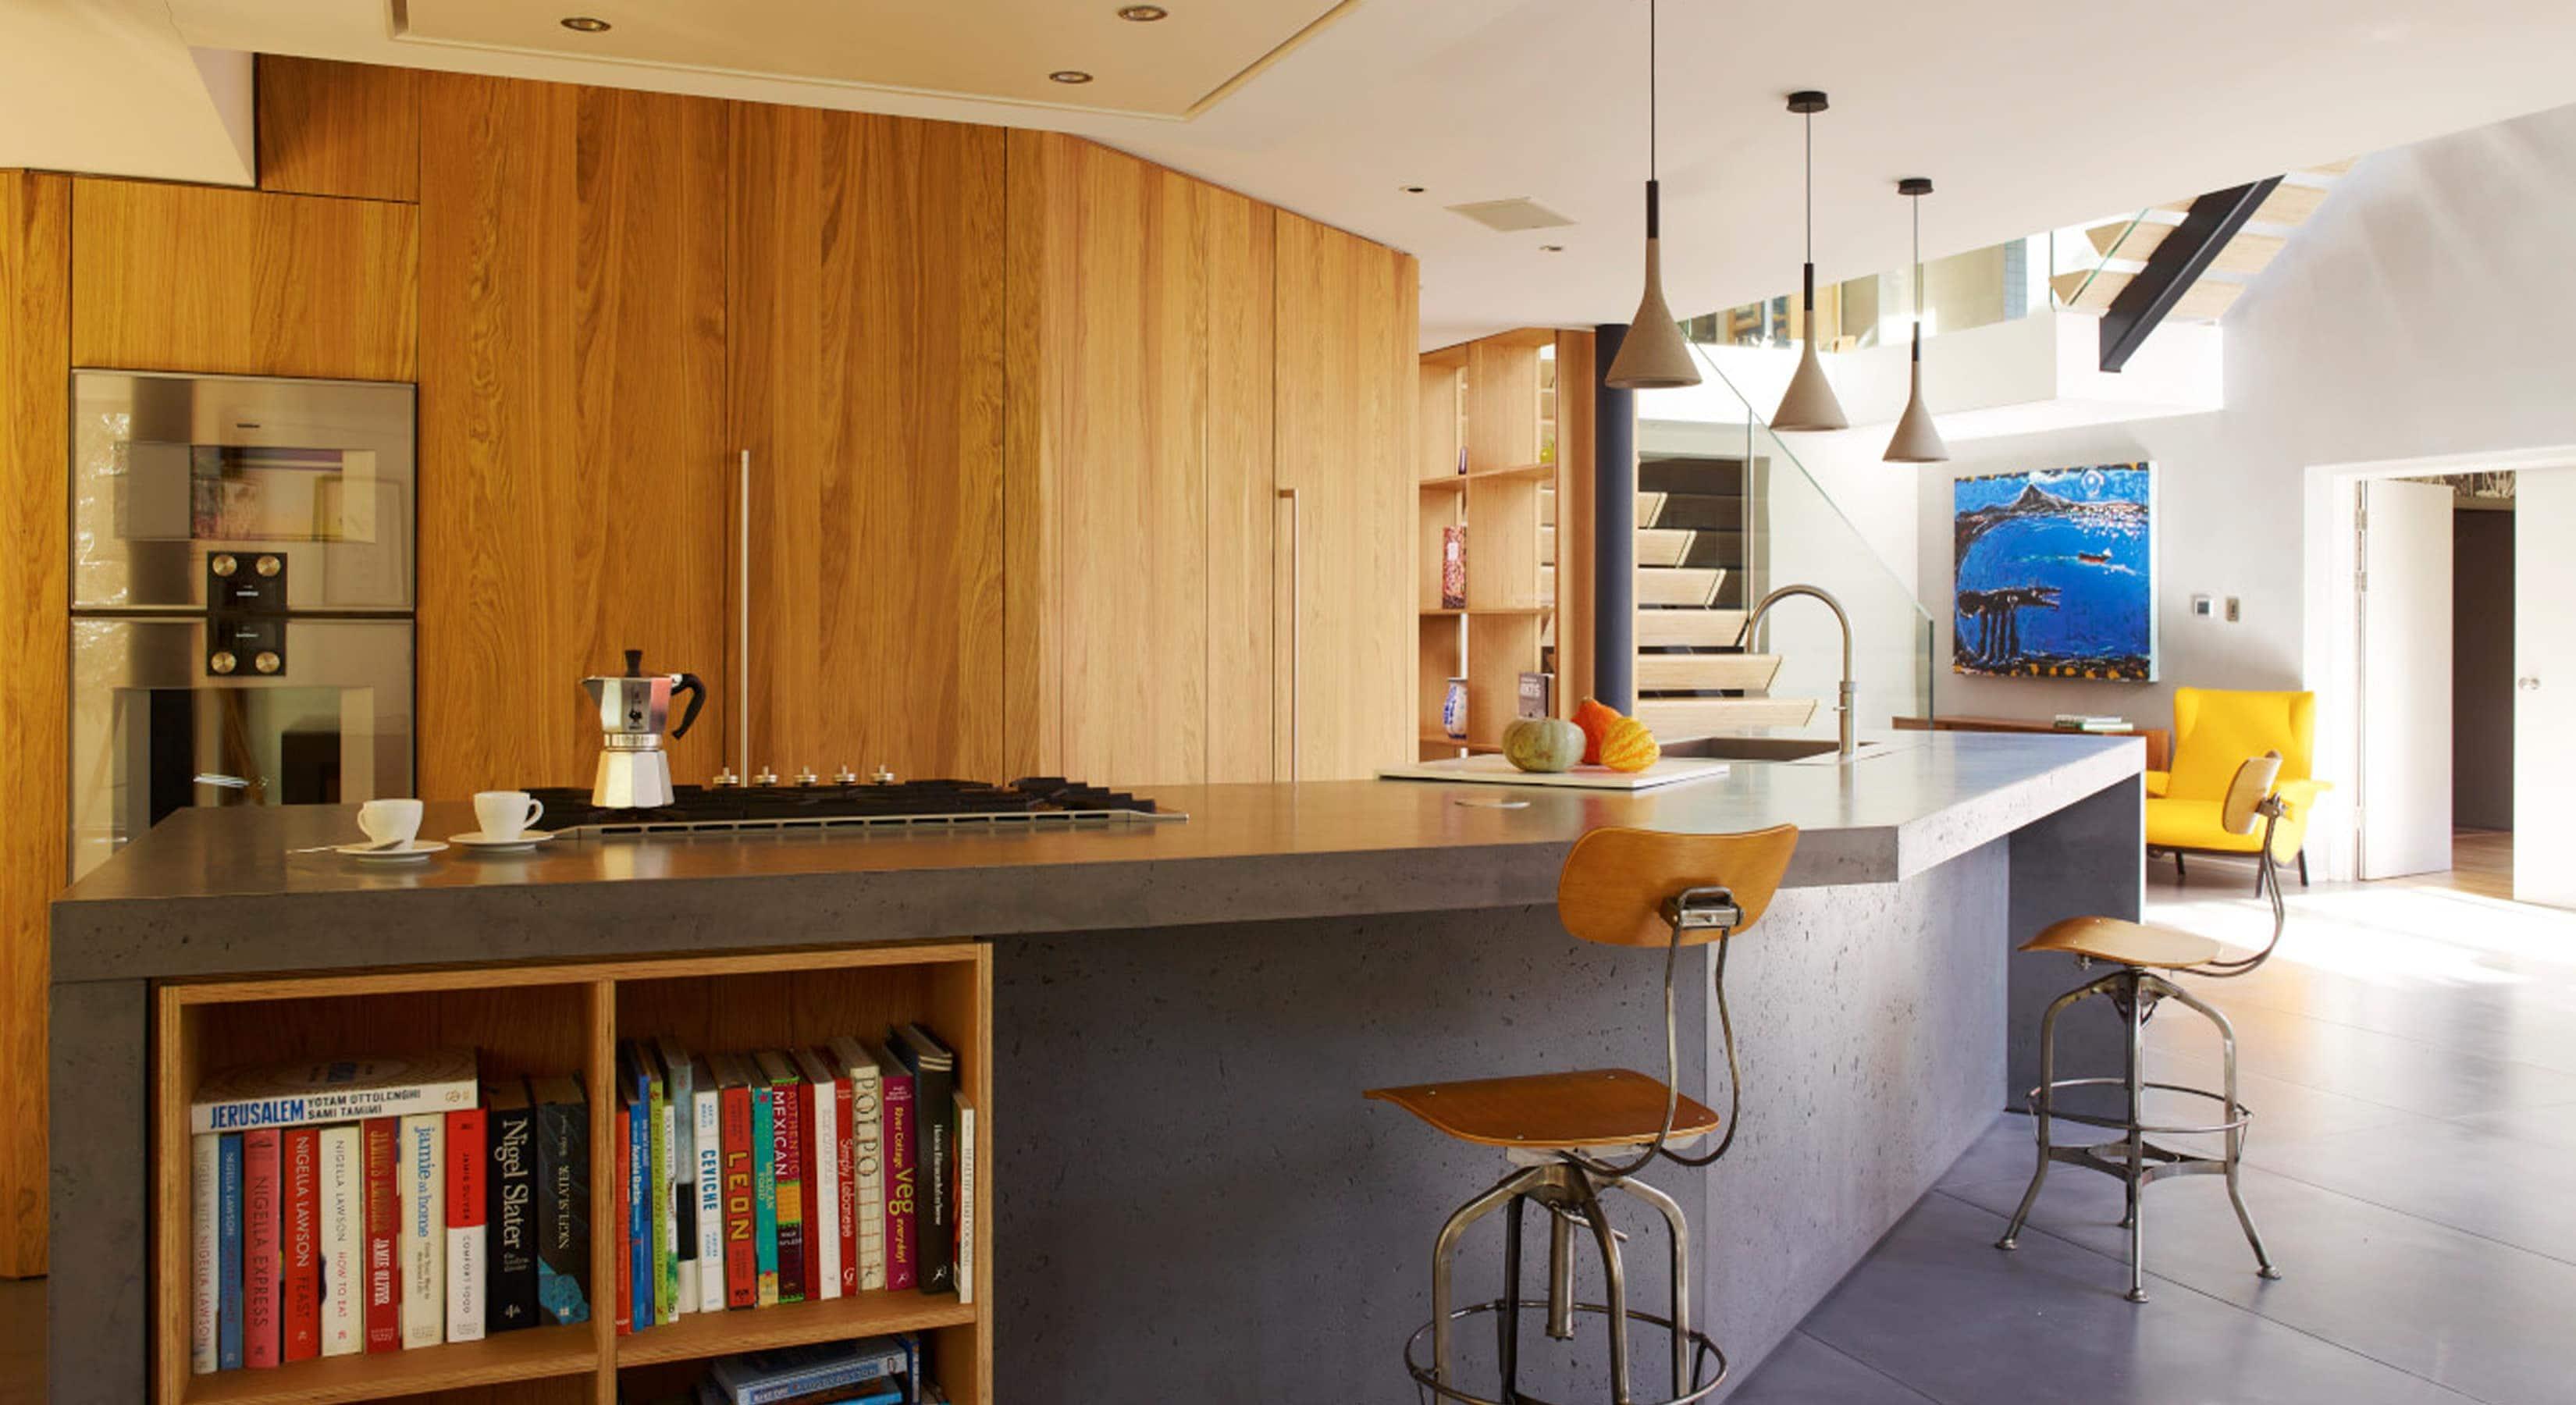 Uplands kitchen extension concept